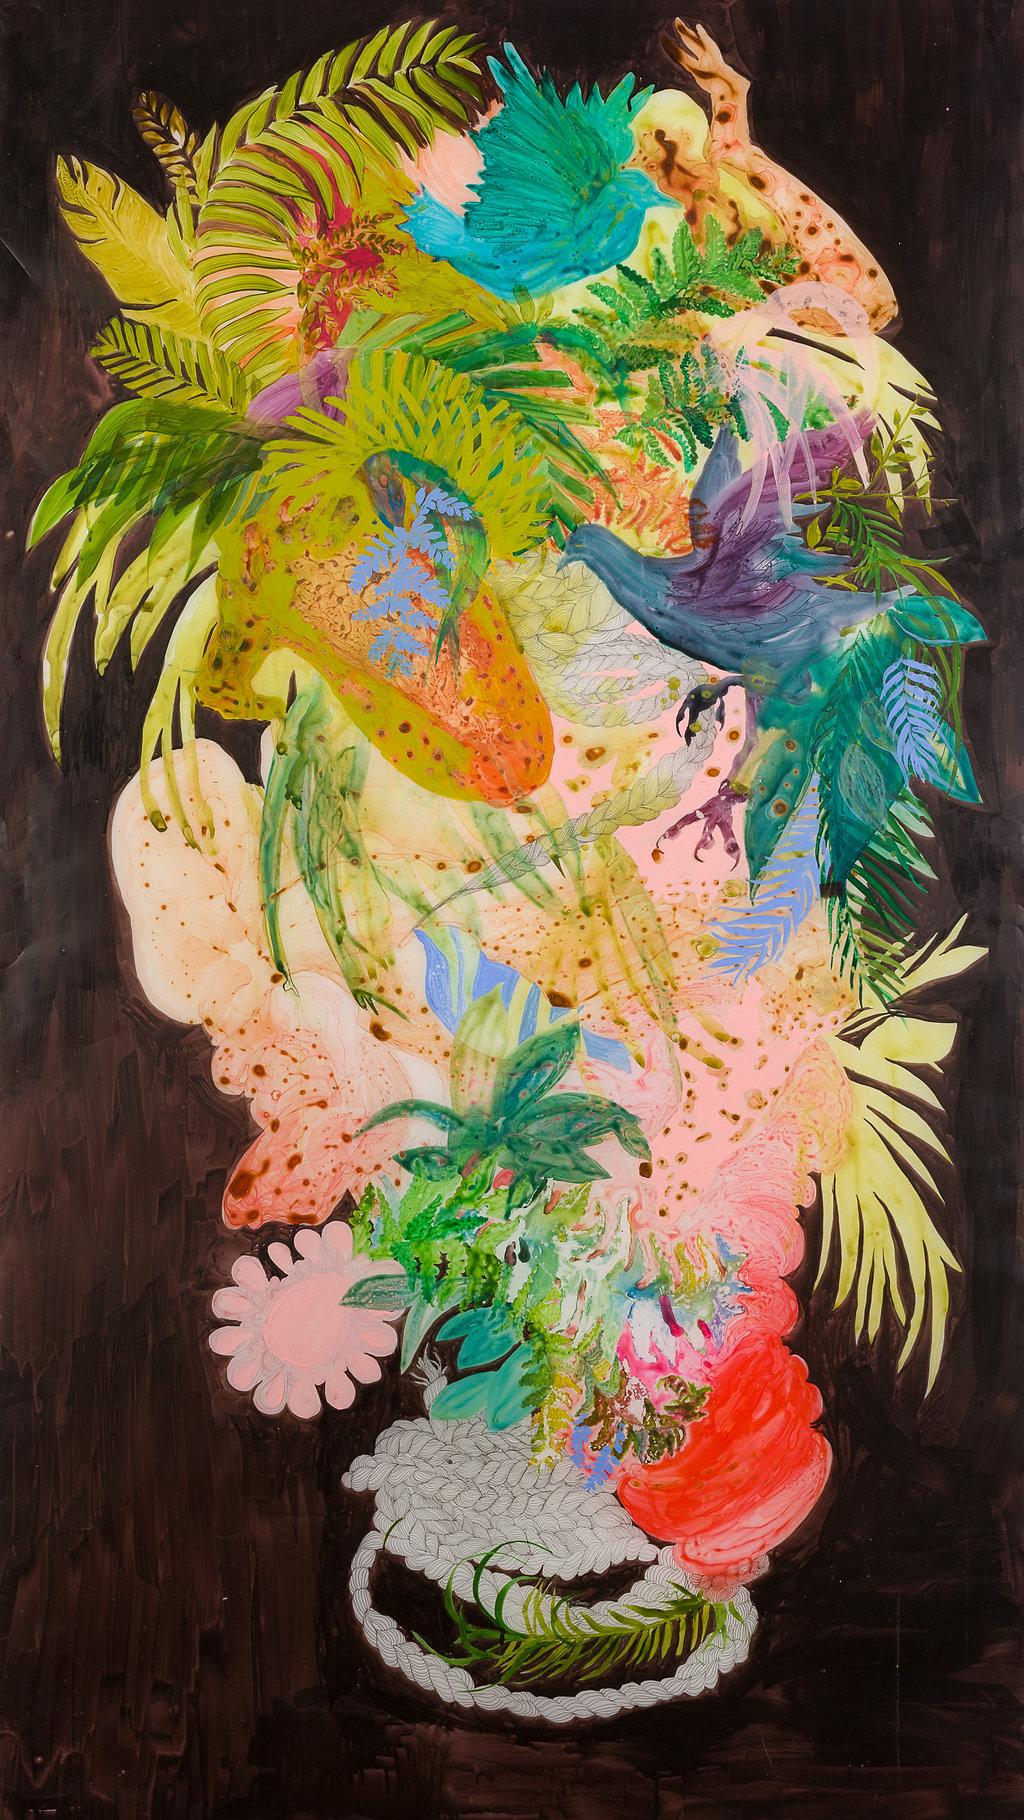 Firelei Báez, Untitled, 2014, acrylic on vellum, 74 x 42 inches (188 x 106.7 cm)